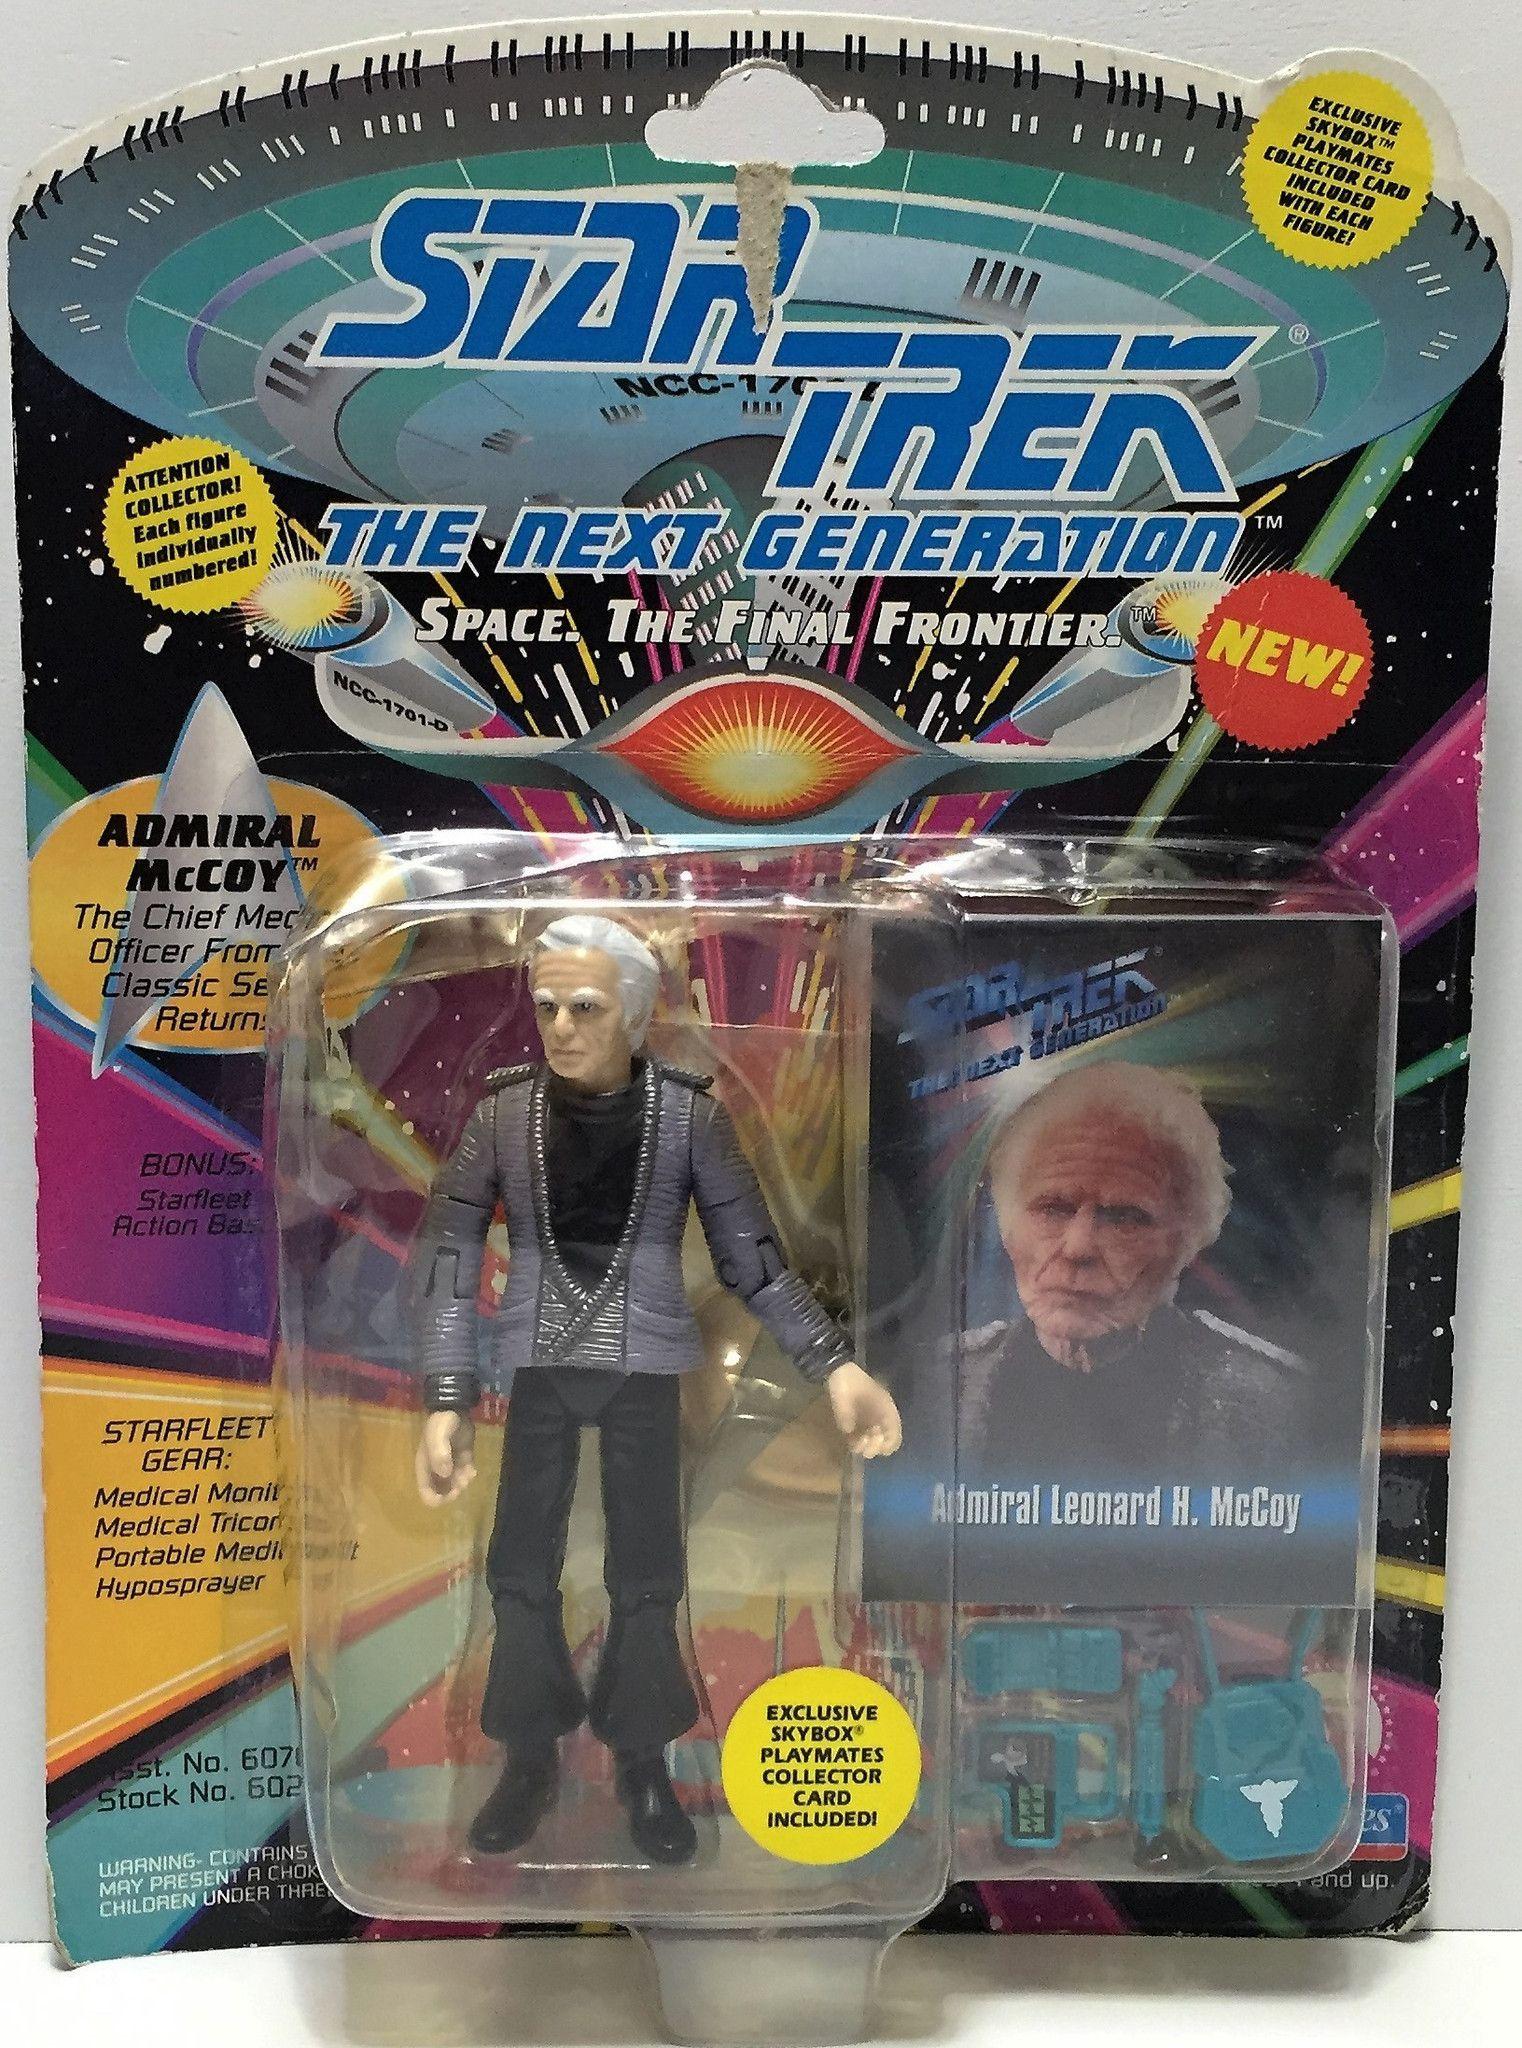 1993 Playmates Star Trek The Next Generation Vorgon-Complete VINTAGE